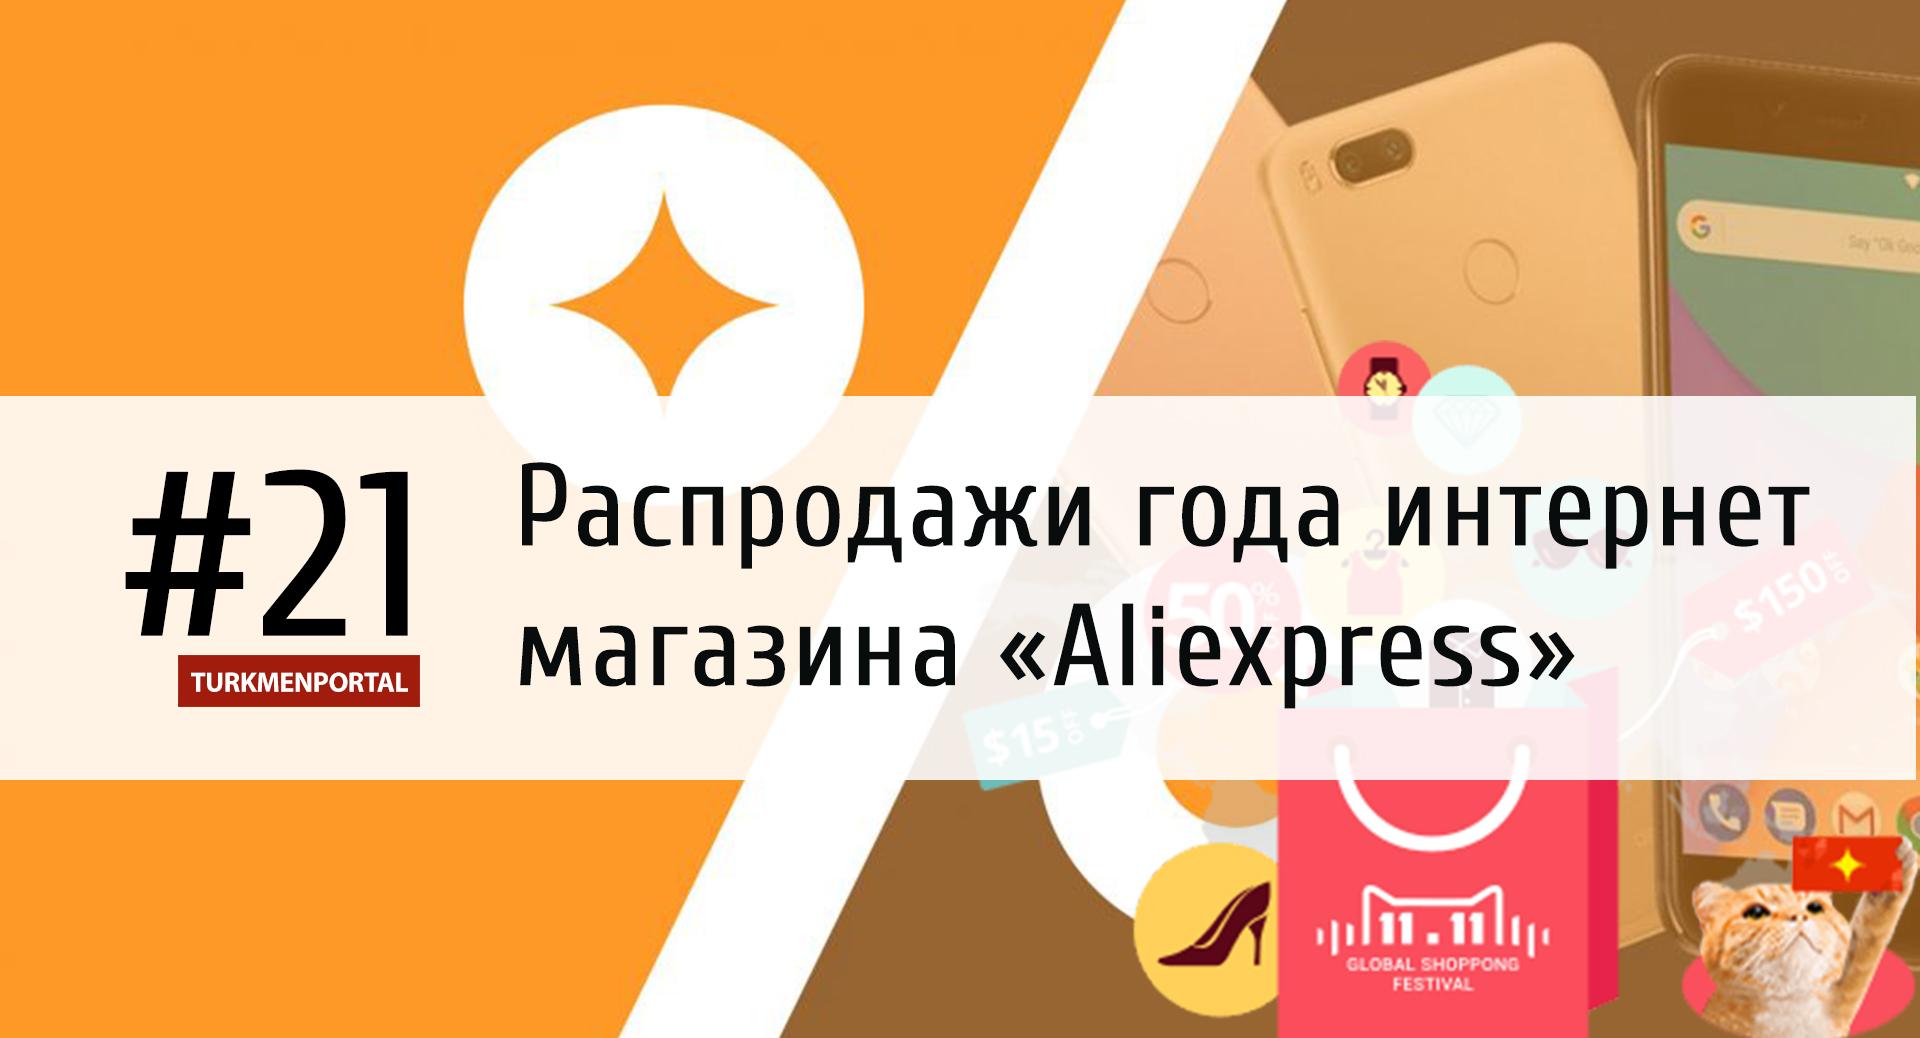 41c5469a7c57b Распродажи года интернет магазина «Aliexpress»